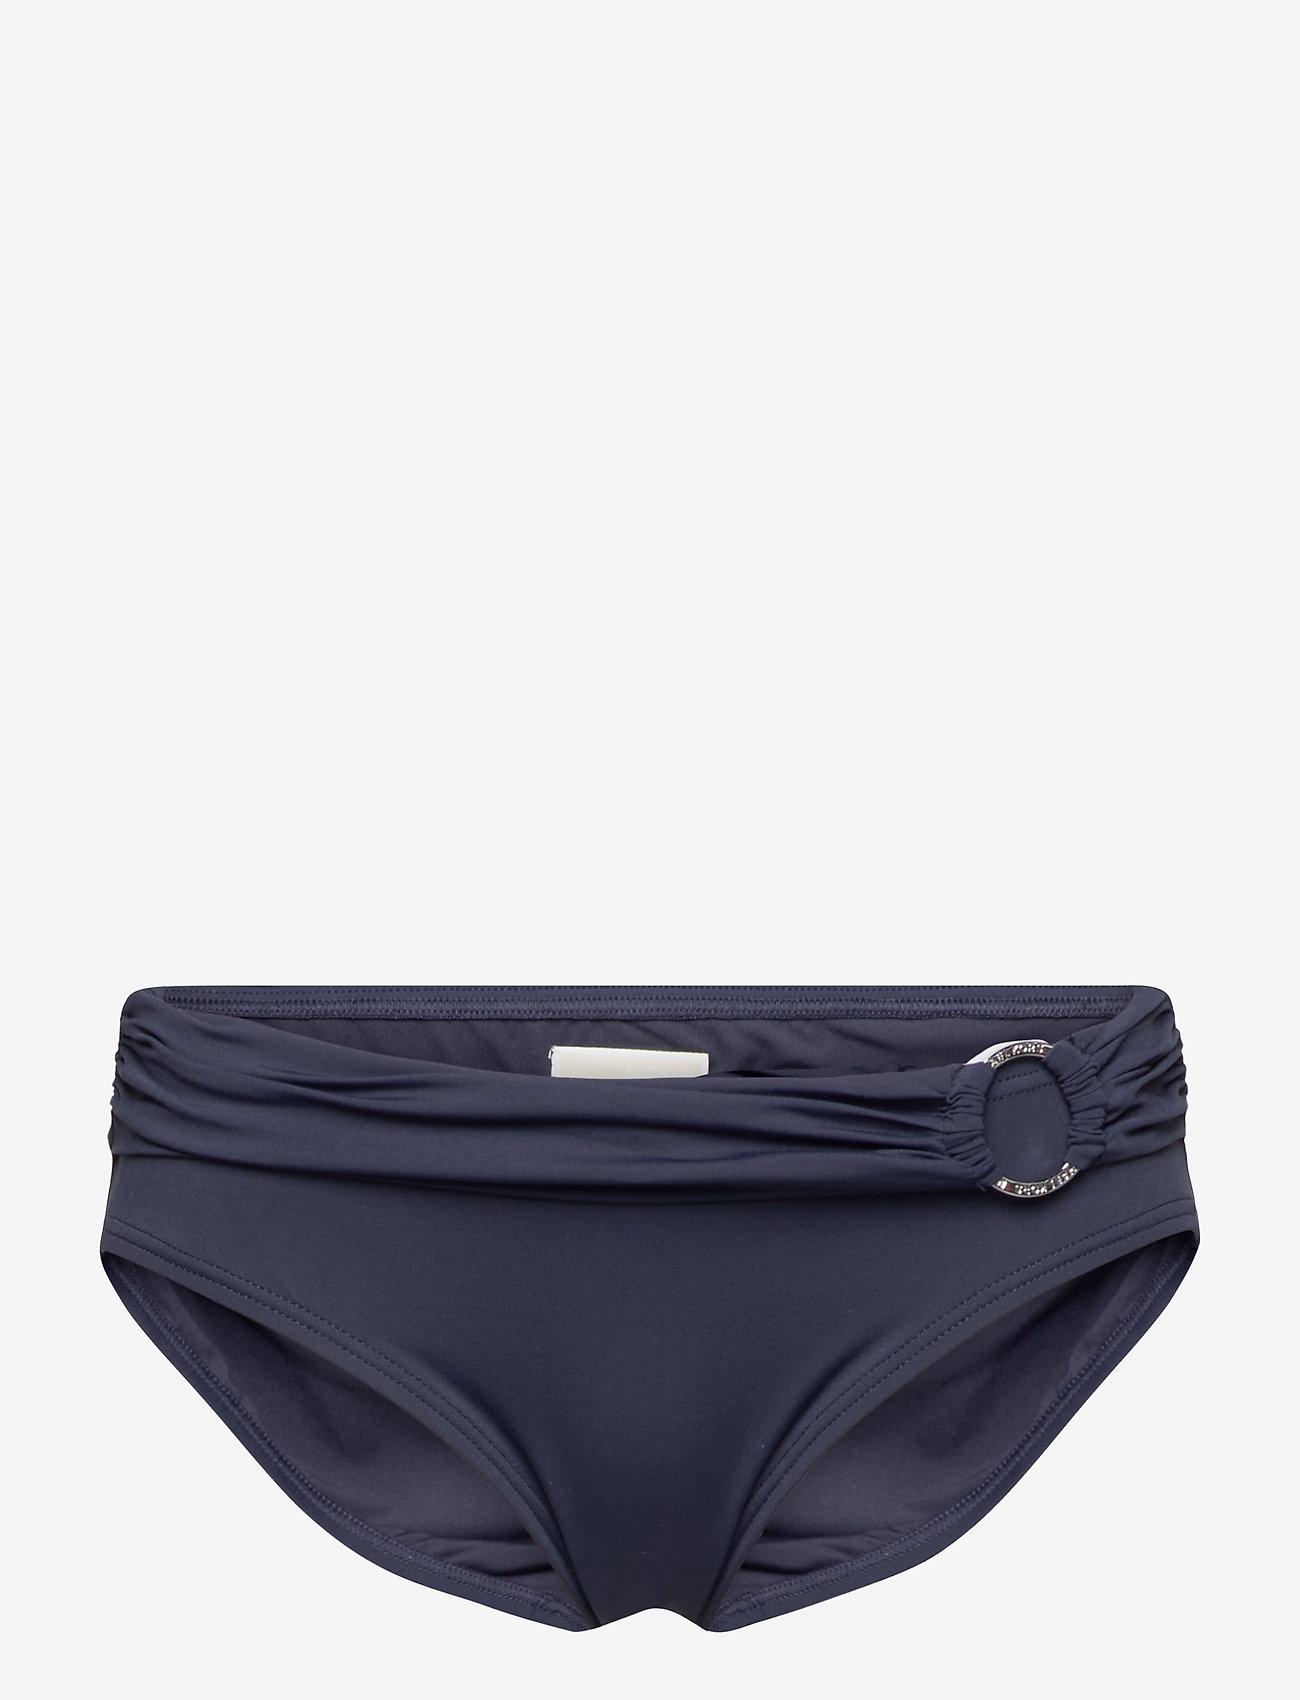 Michael Kors Swimwear - BIKINI BTM - bikinibroekjes - new navy - 0